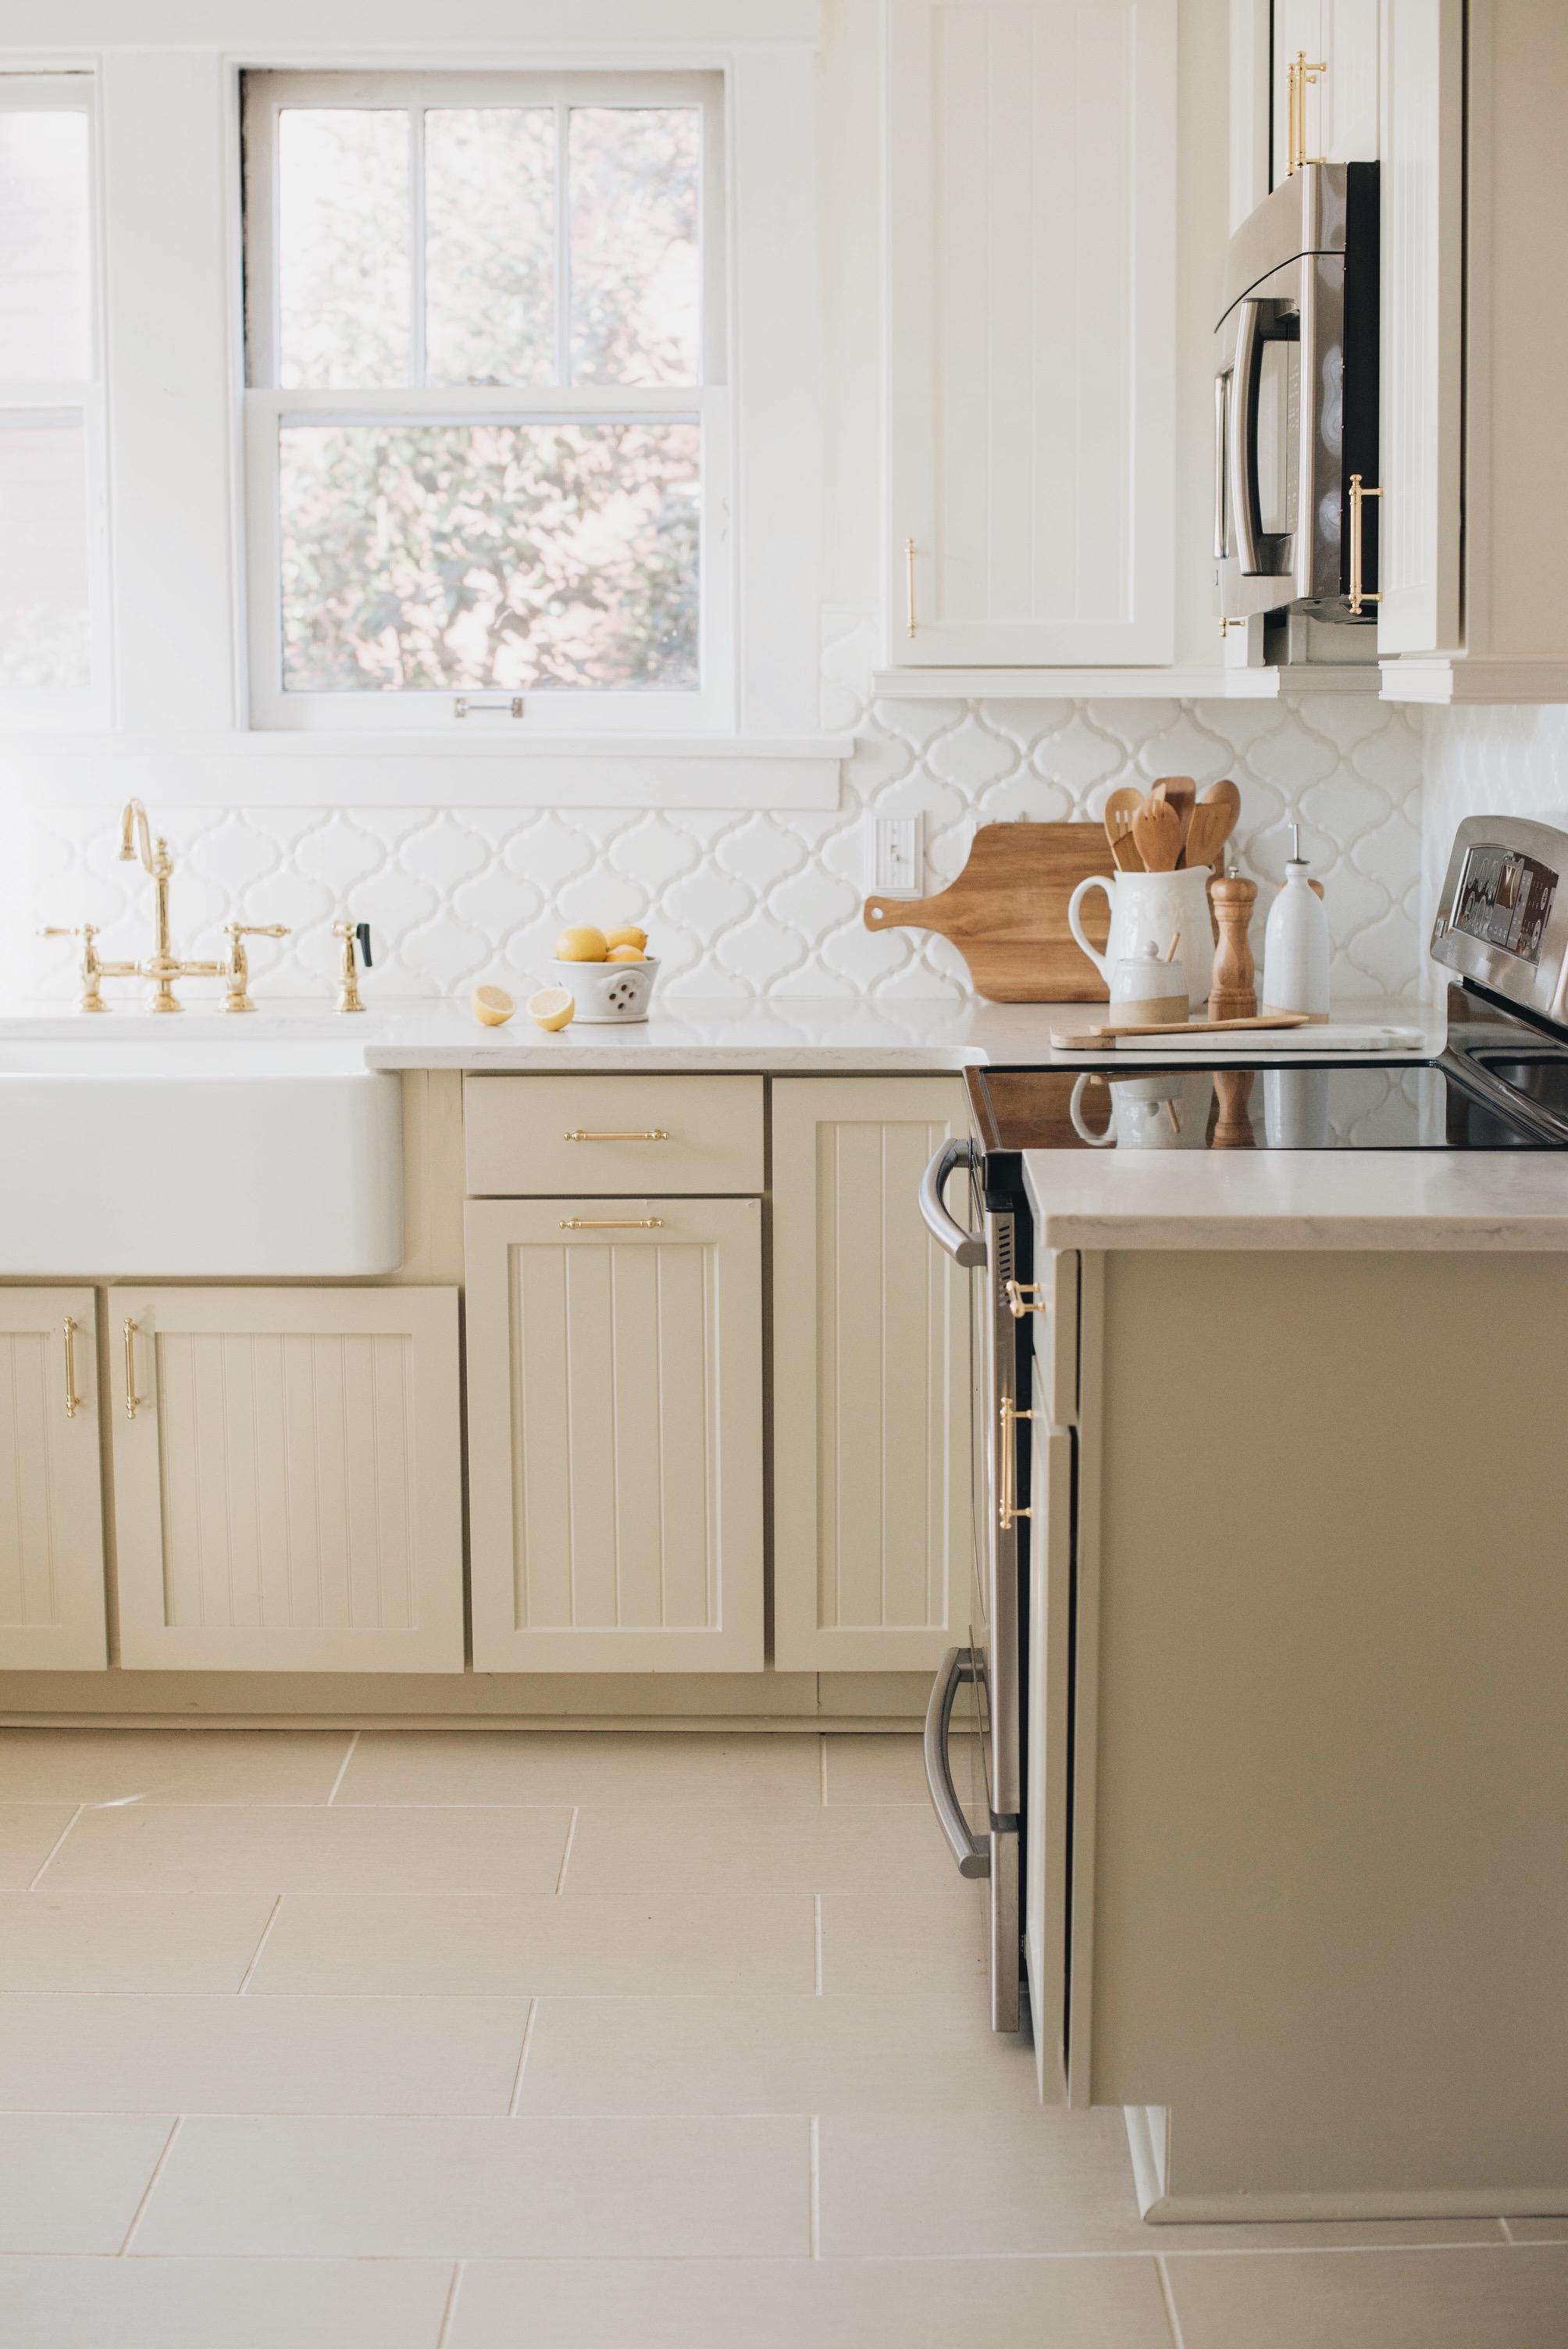 Upper Cabinets: BM White Dove   Lower Cabinets: BM Coastal Fog   Sarah Catherine Design